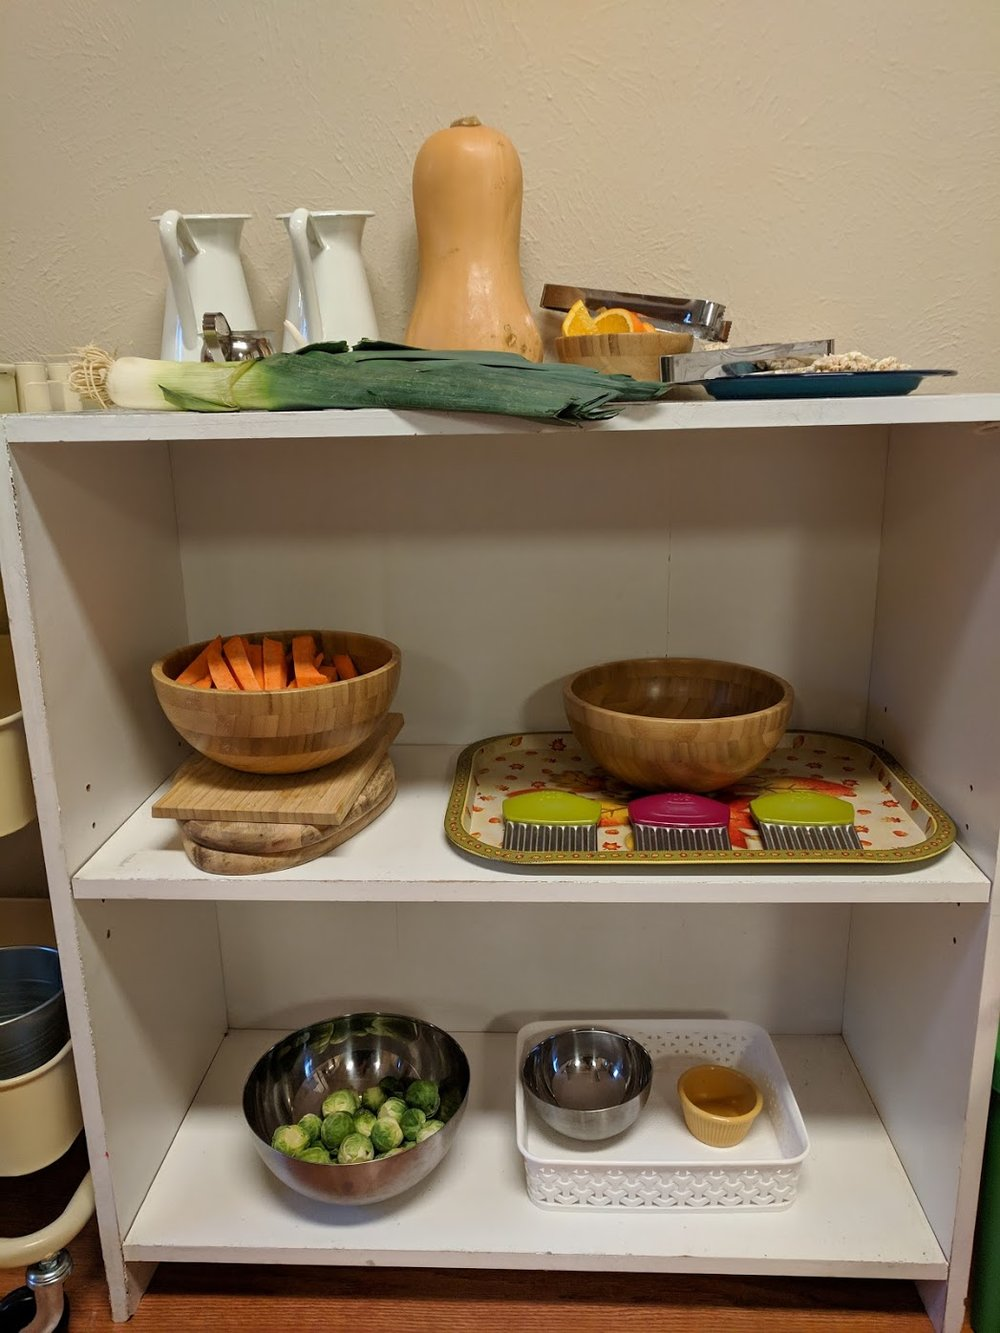 Food Preparation The Montessori School of Evergreen 2018